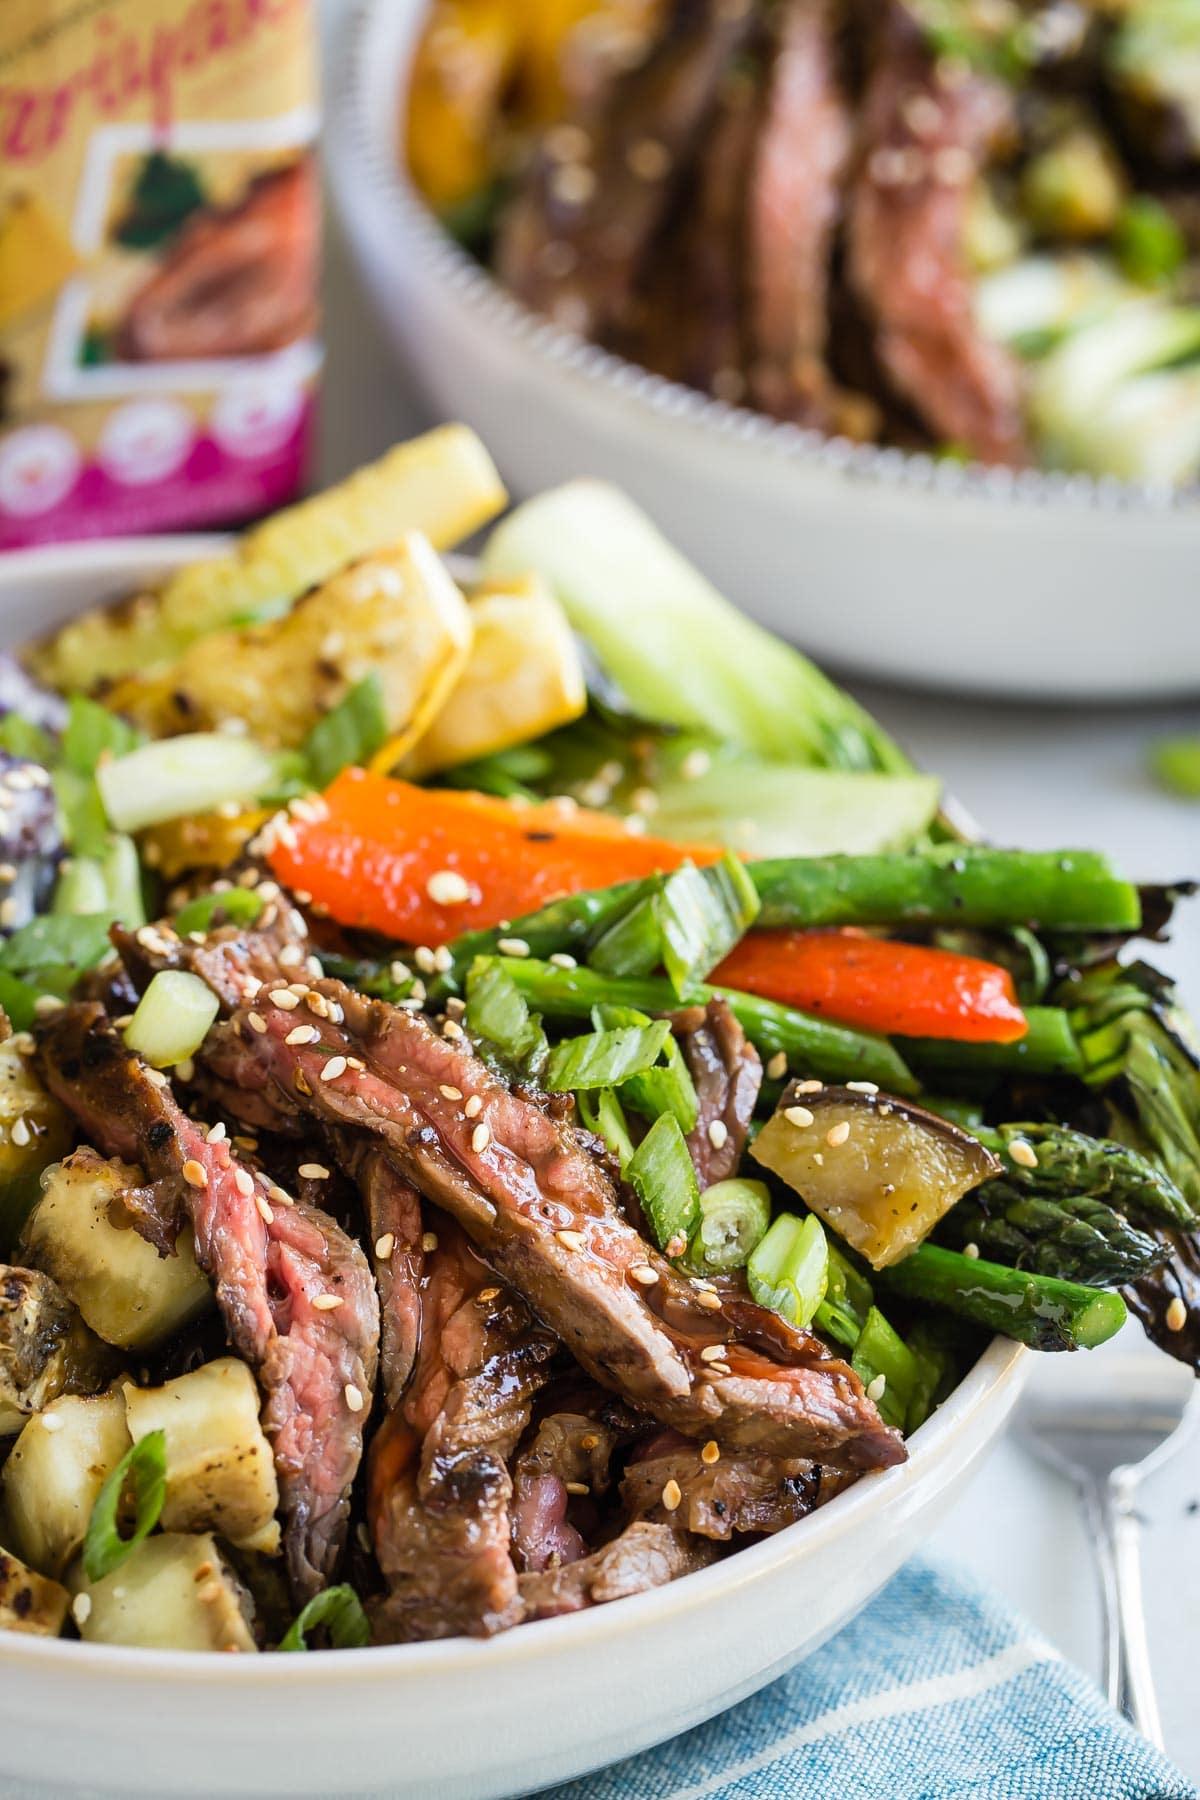 Grilled summer vegetables with World Harbors beef teriyaki skirt steak and healthy freekeh super-grain.